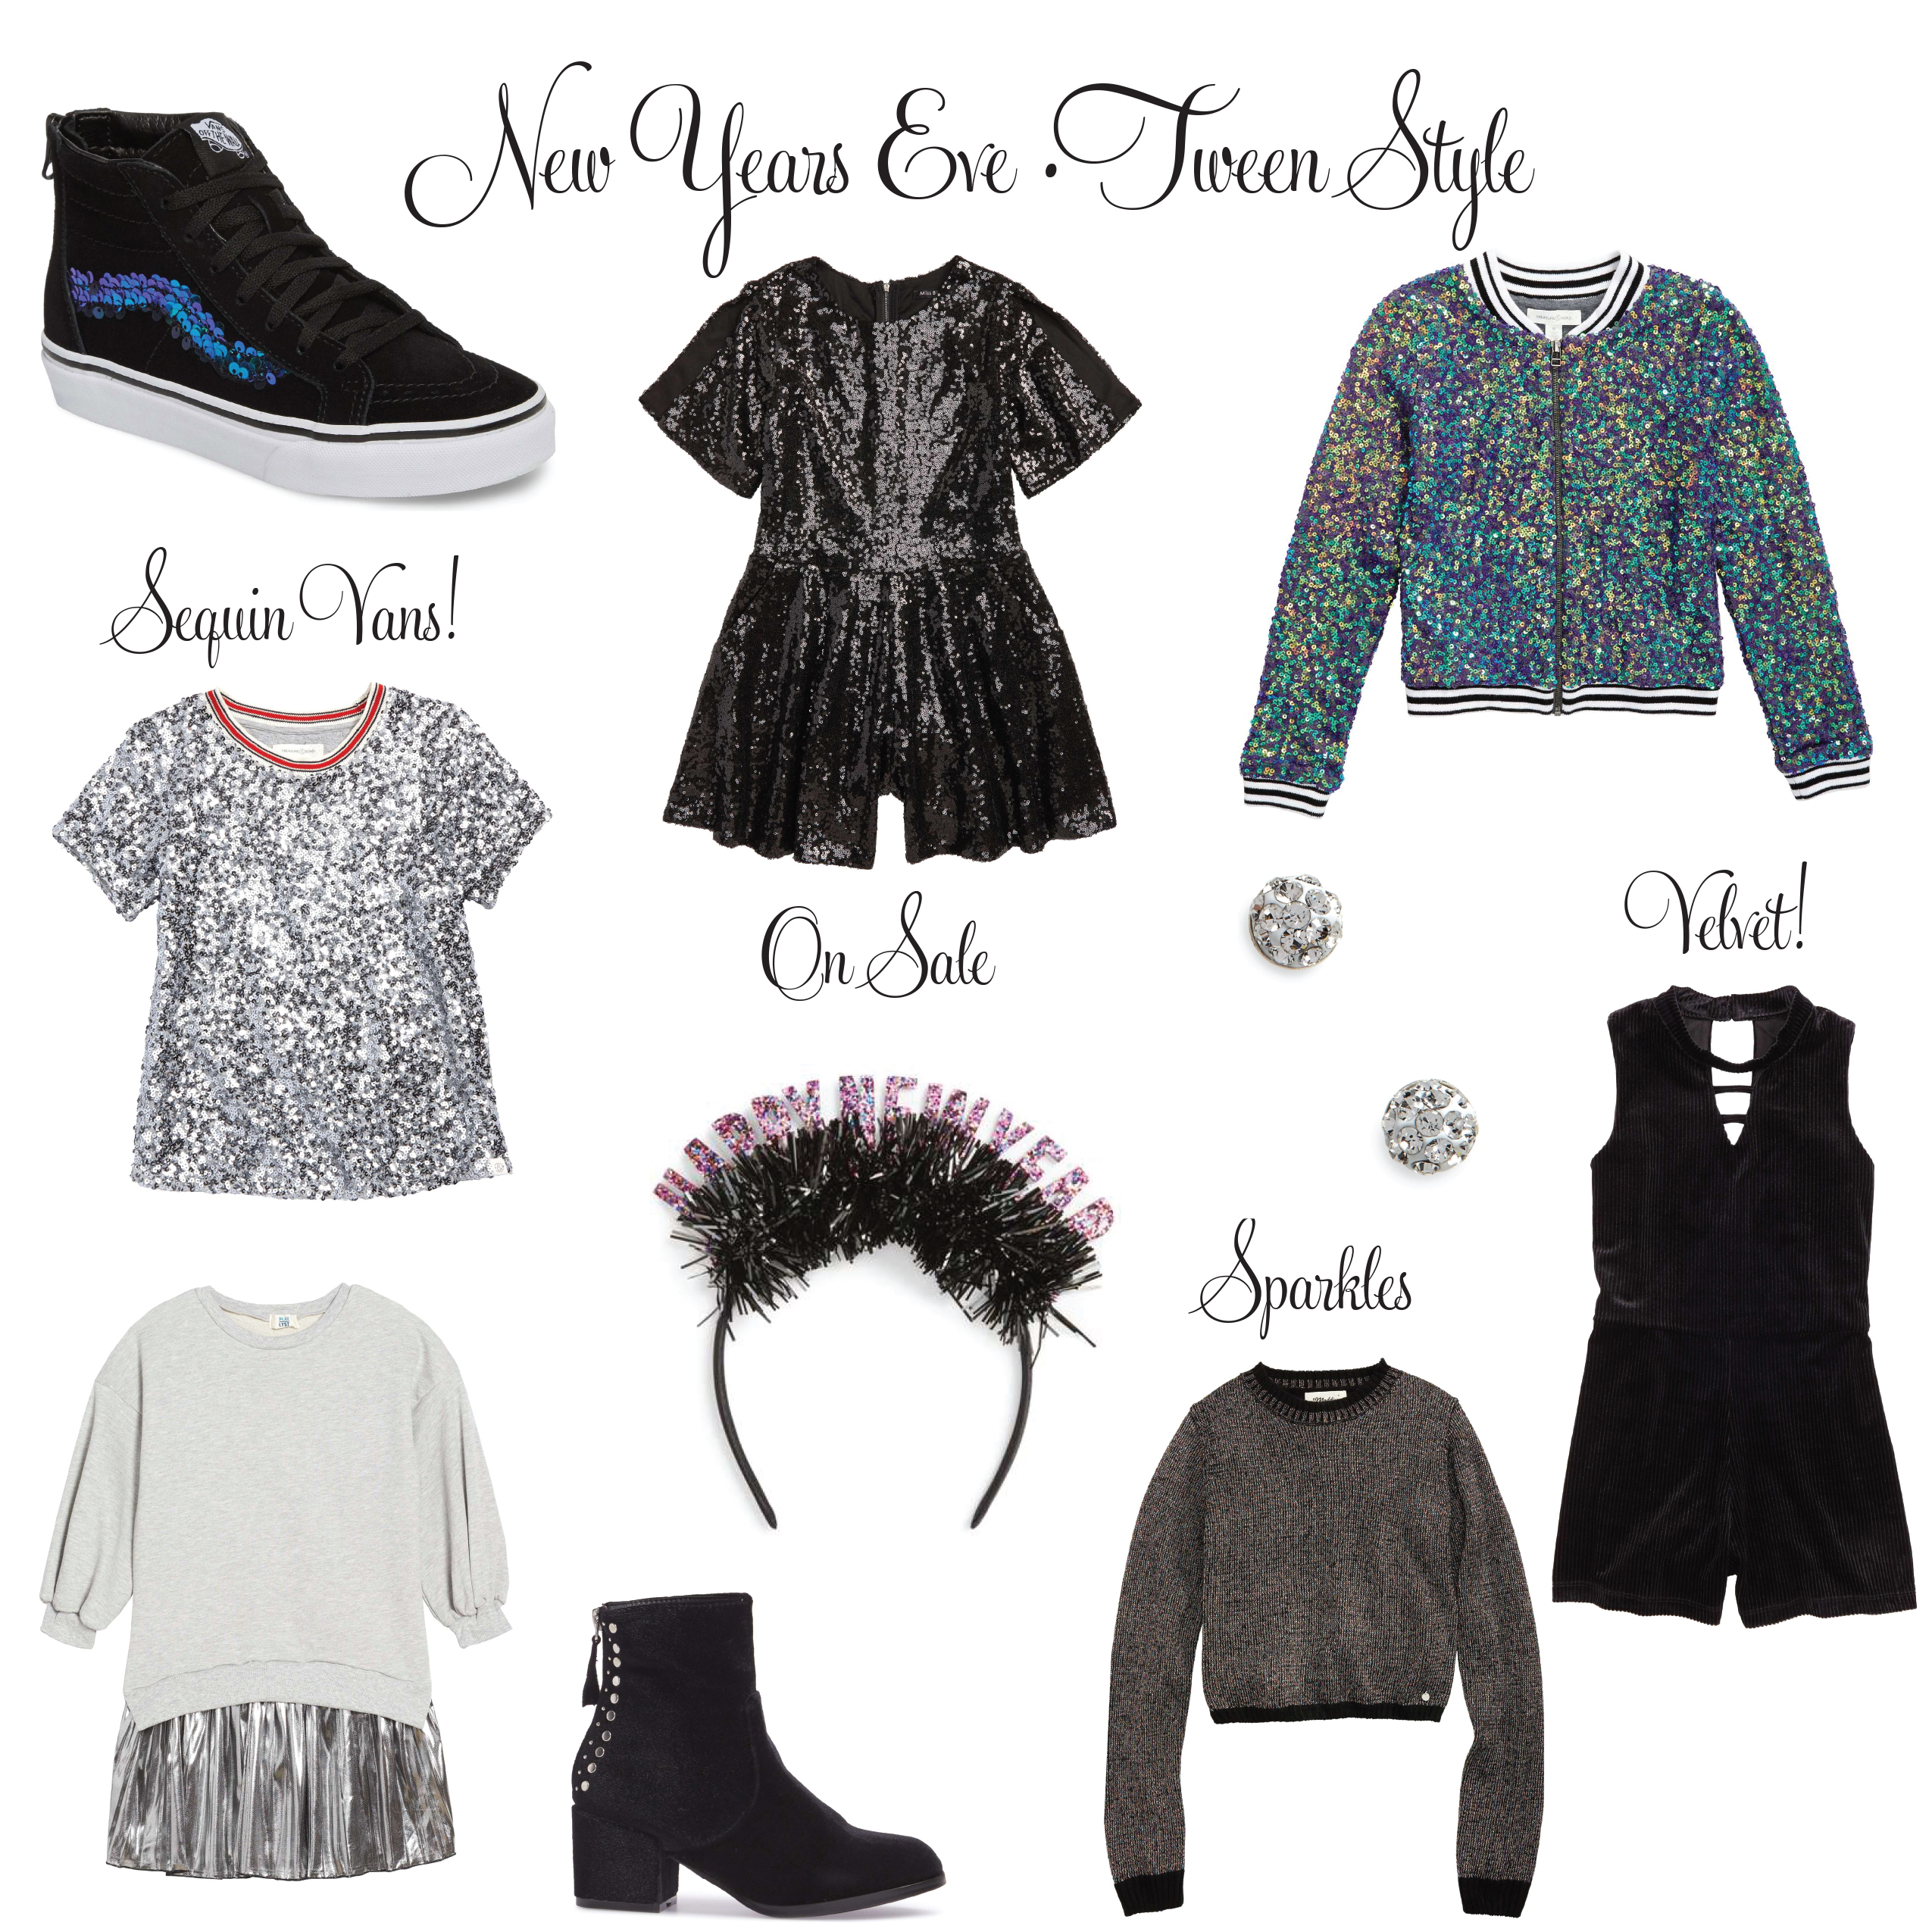 New Years Eve Tween Style Ideas!